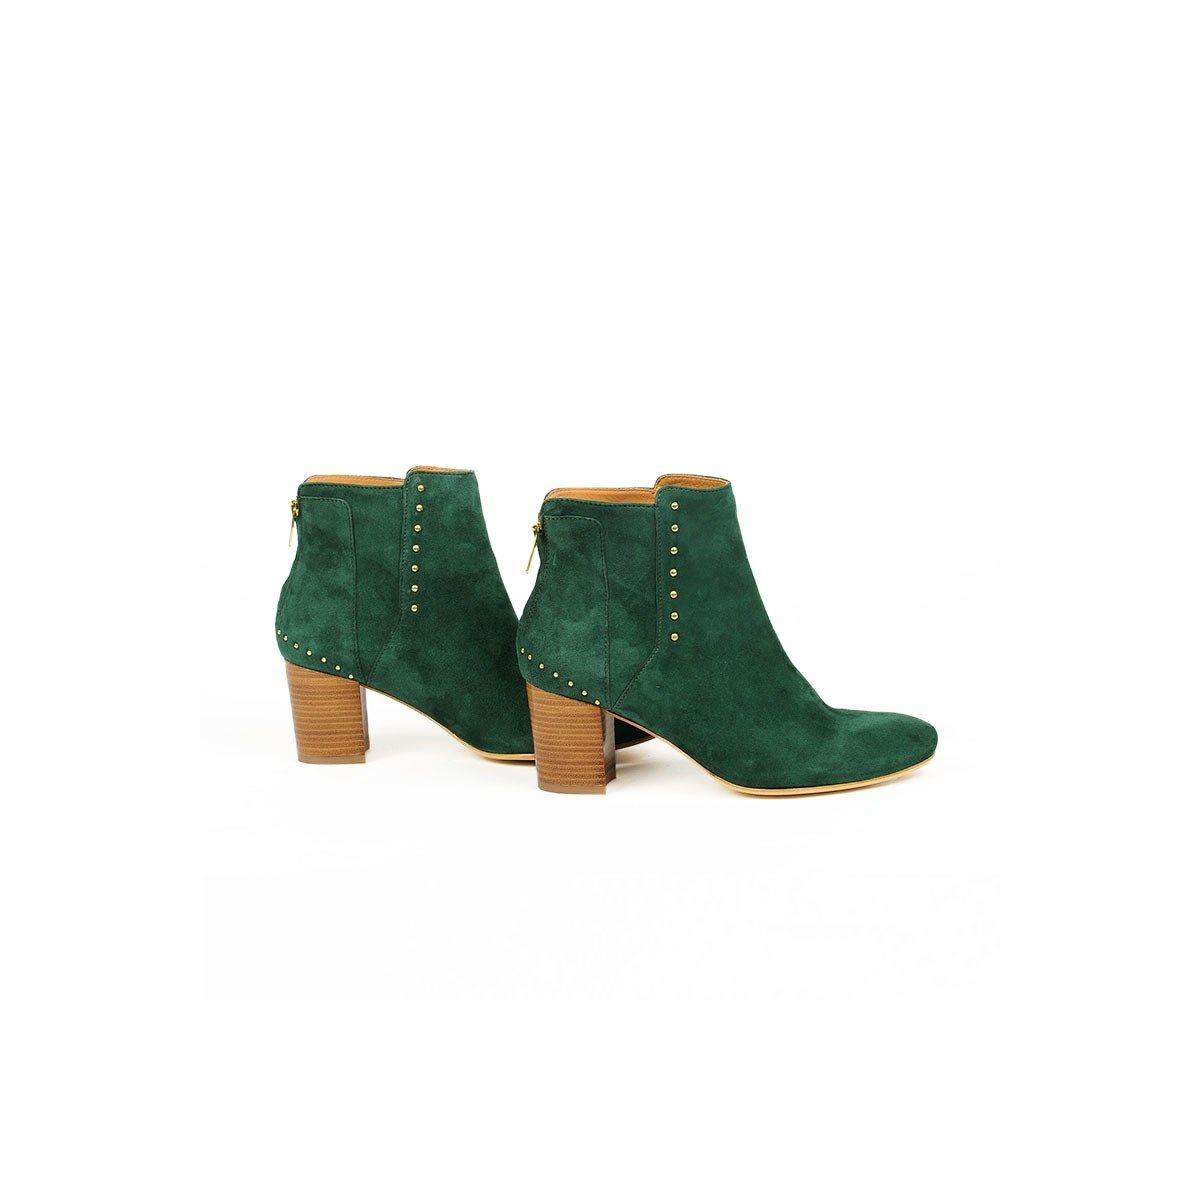 Boots Tijuana en cuir